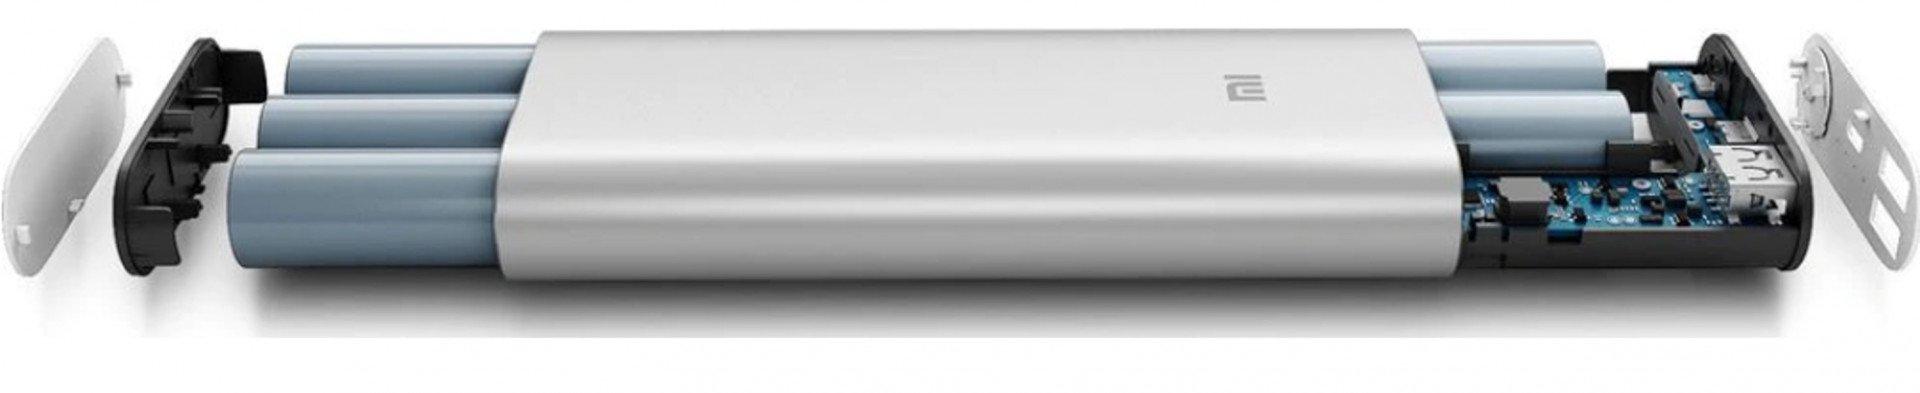 Xiaomi Power Bank 16000 mAh (NDY-02-AL)-max